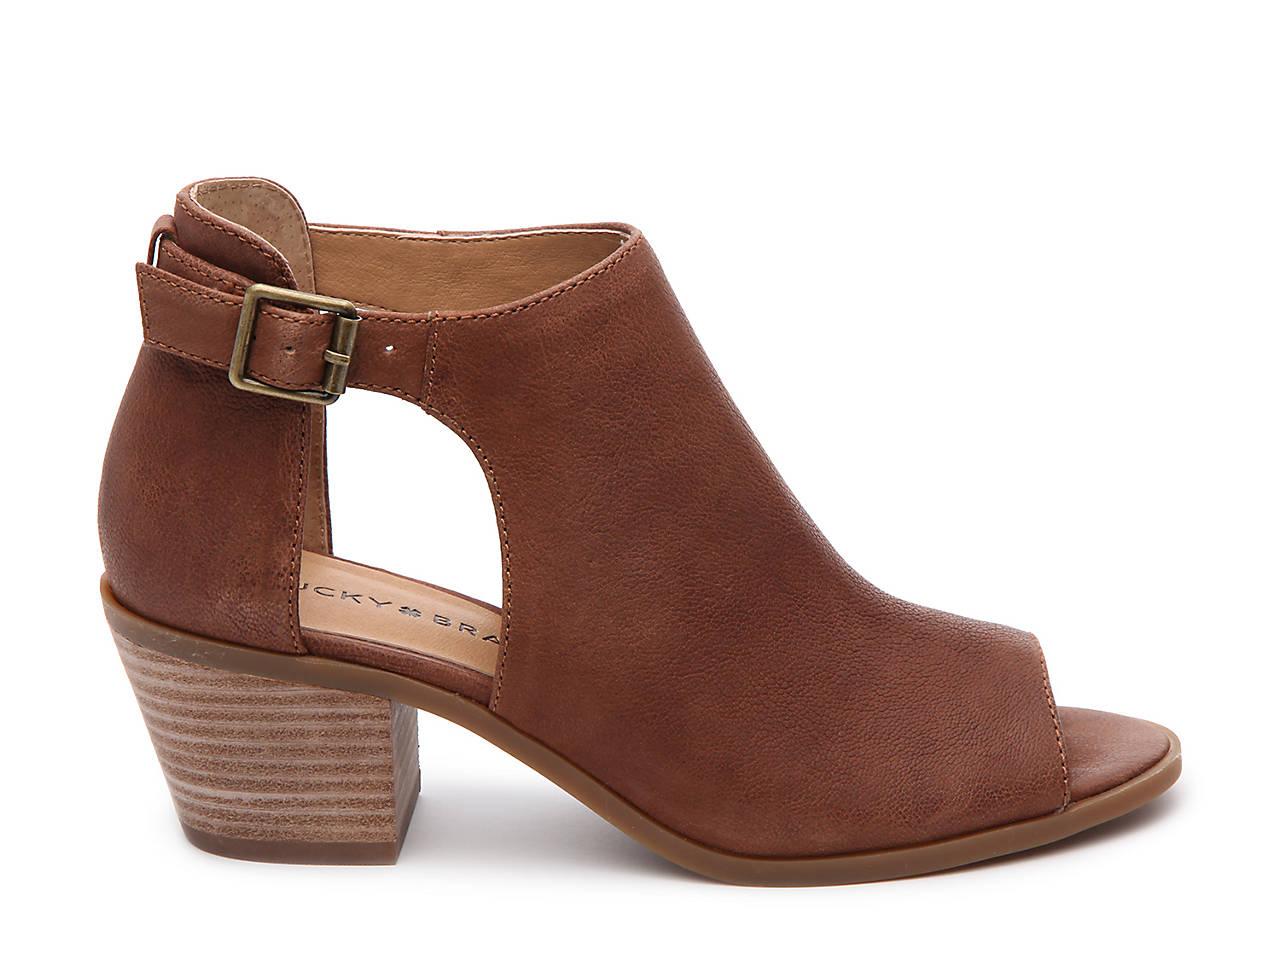 571c4fe07ead Lucky Brand Barimo Bootie Women s Shoes